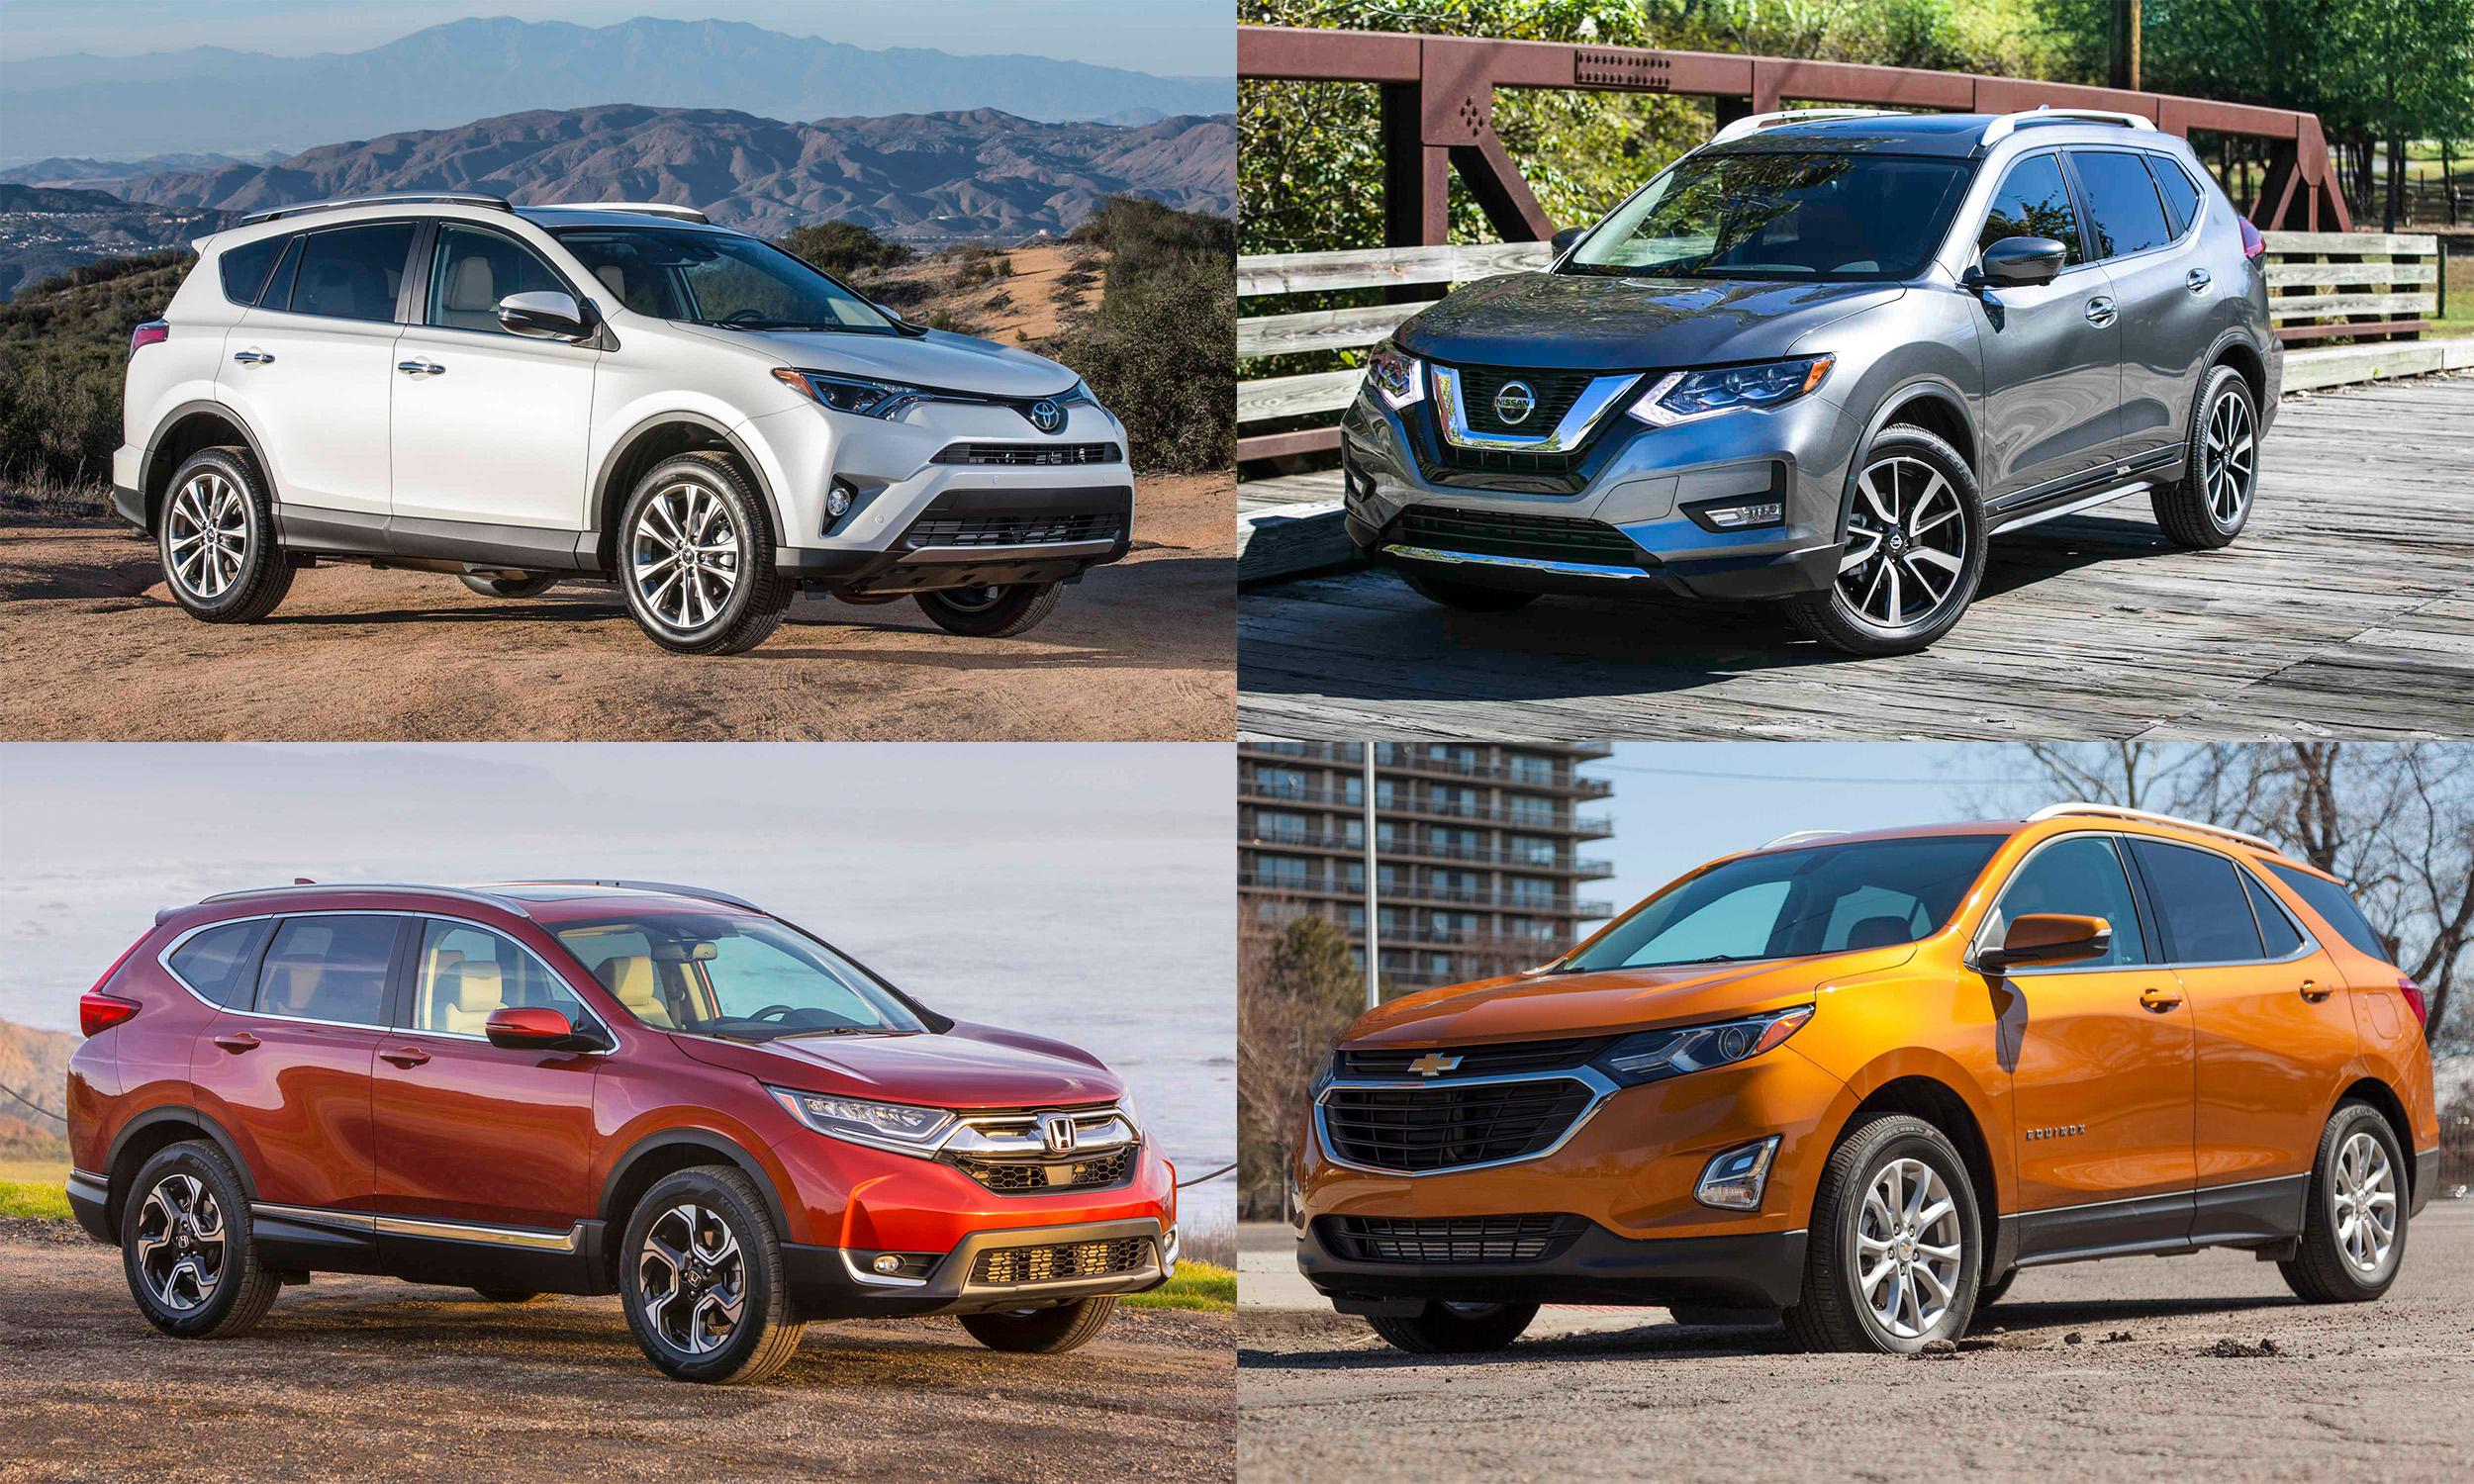 © Toyota Motor Sales; Nissan North America, Inc.; General Motors; American Honda Motor Company